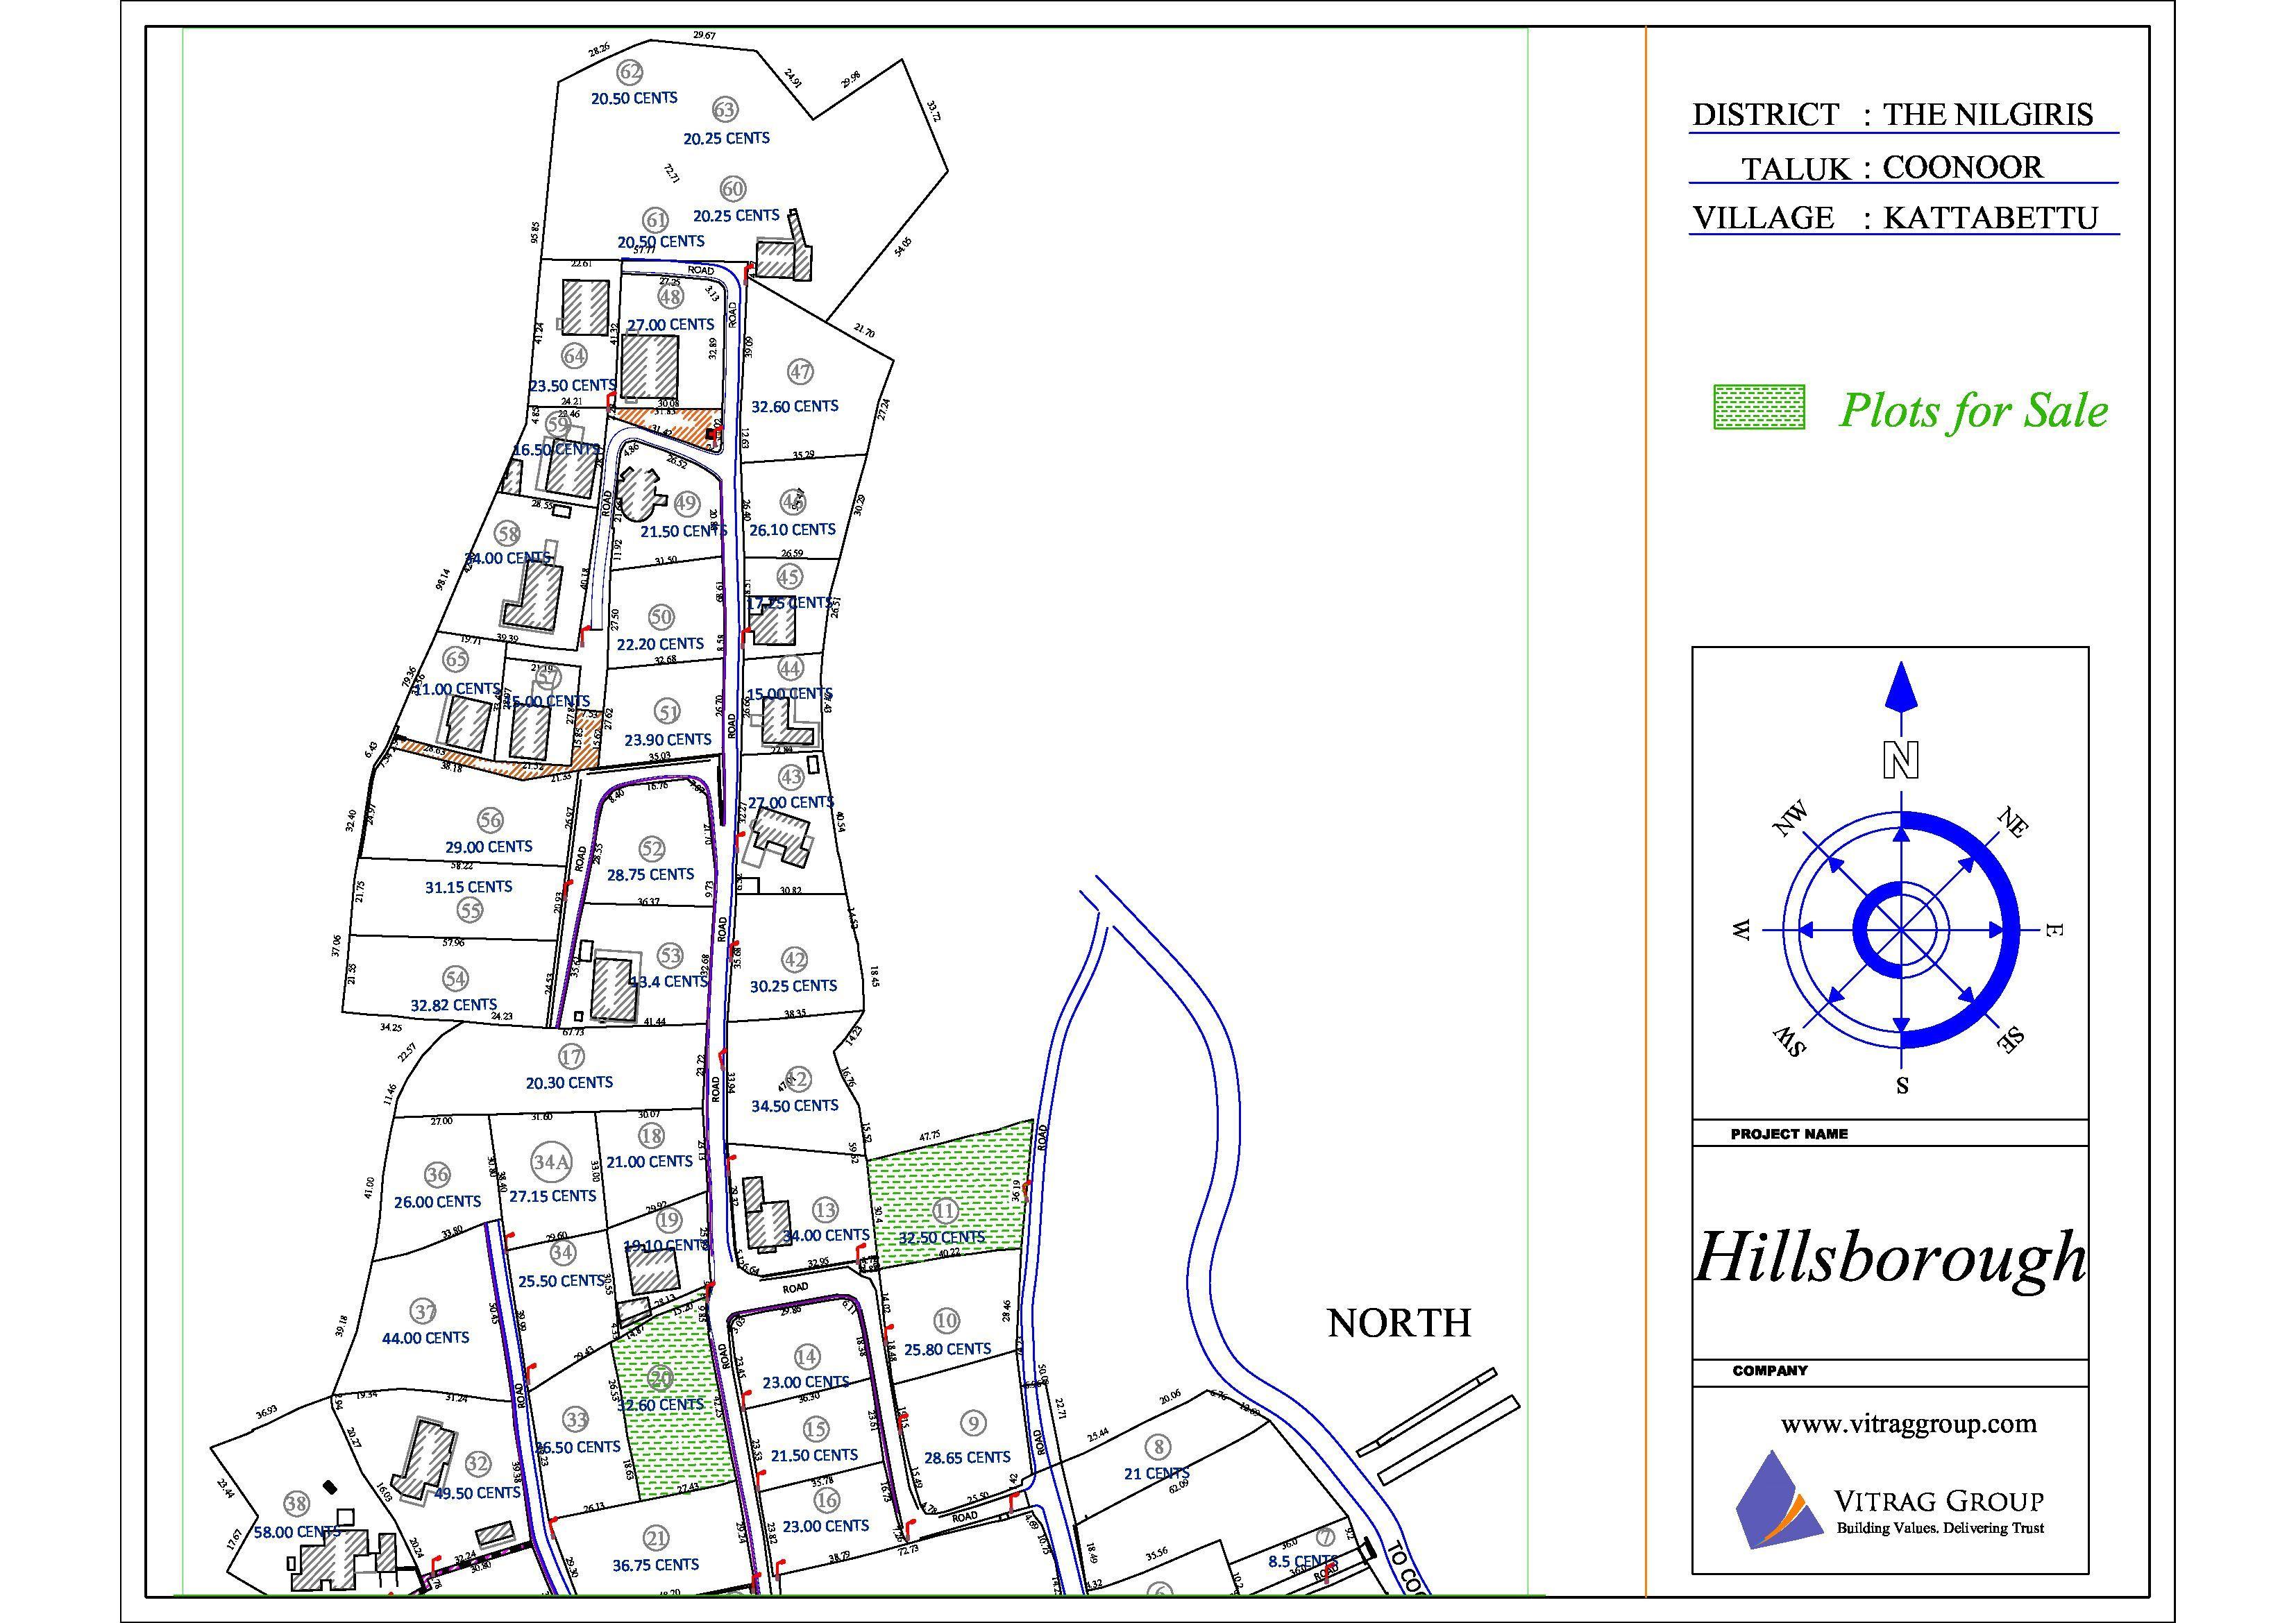 Hillsborough North